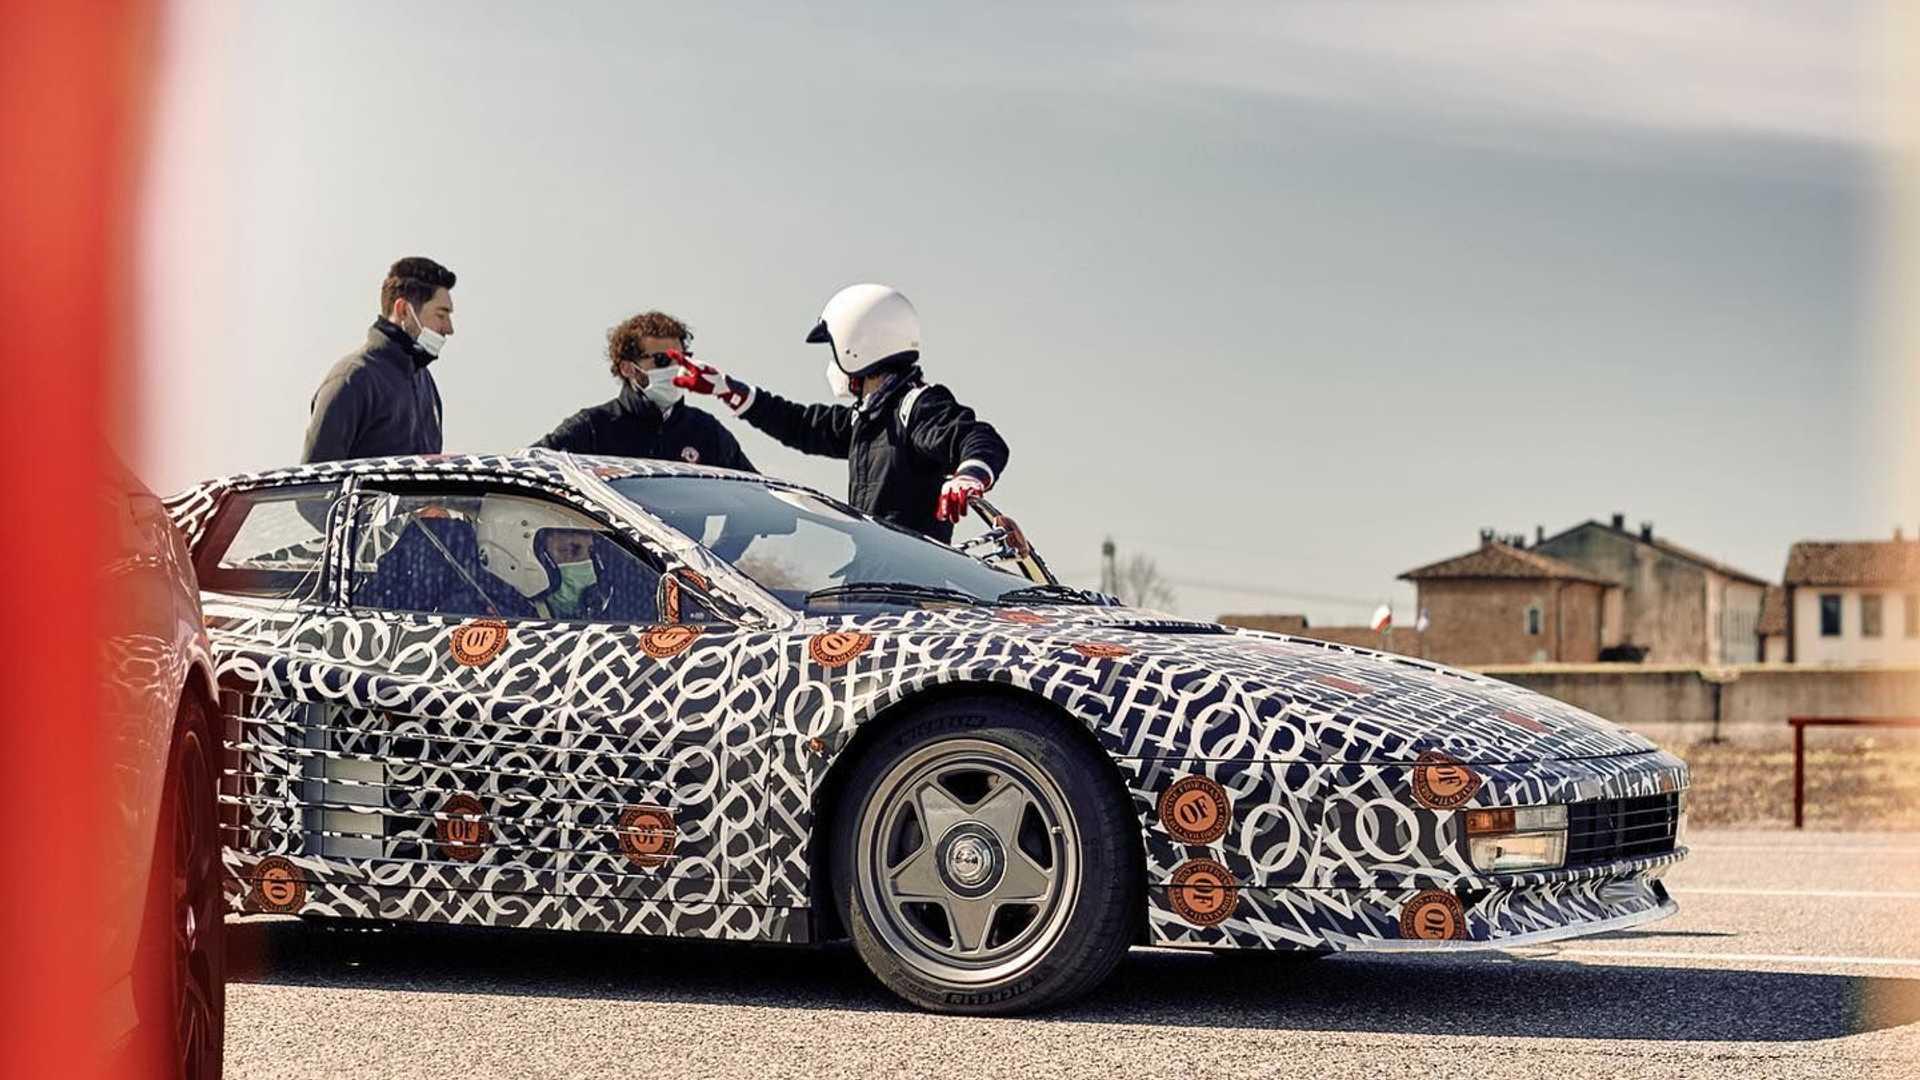 Ferrari-Testarossa-restomod-by-Officine-Fioravanti-8